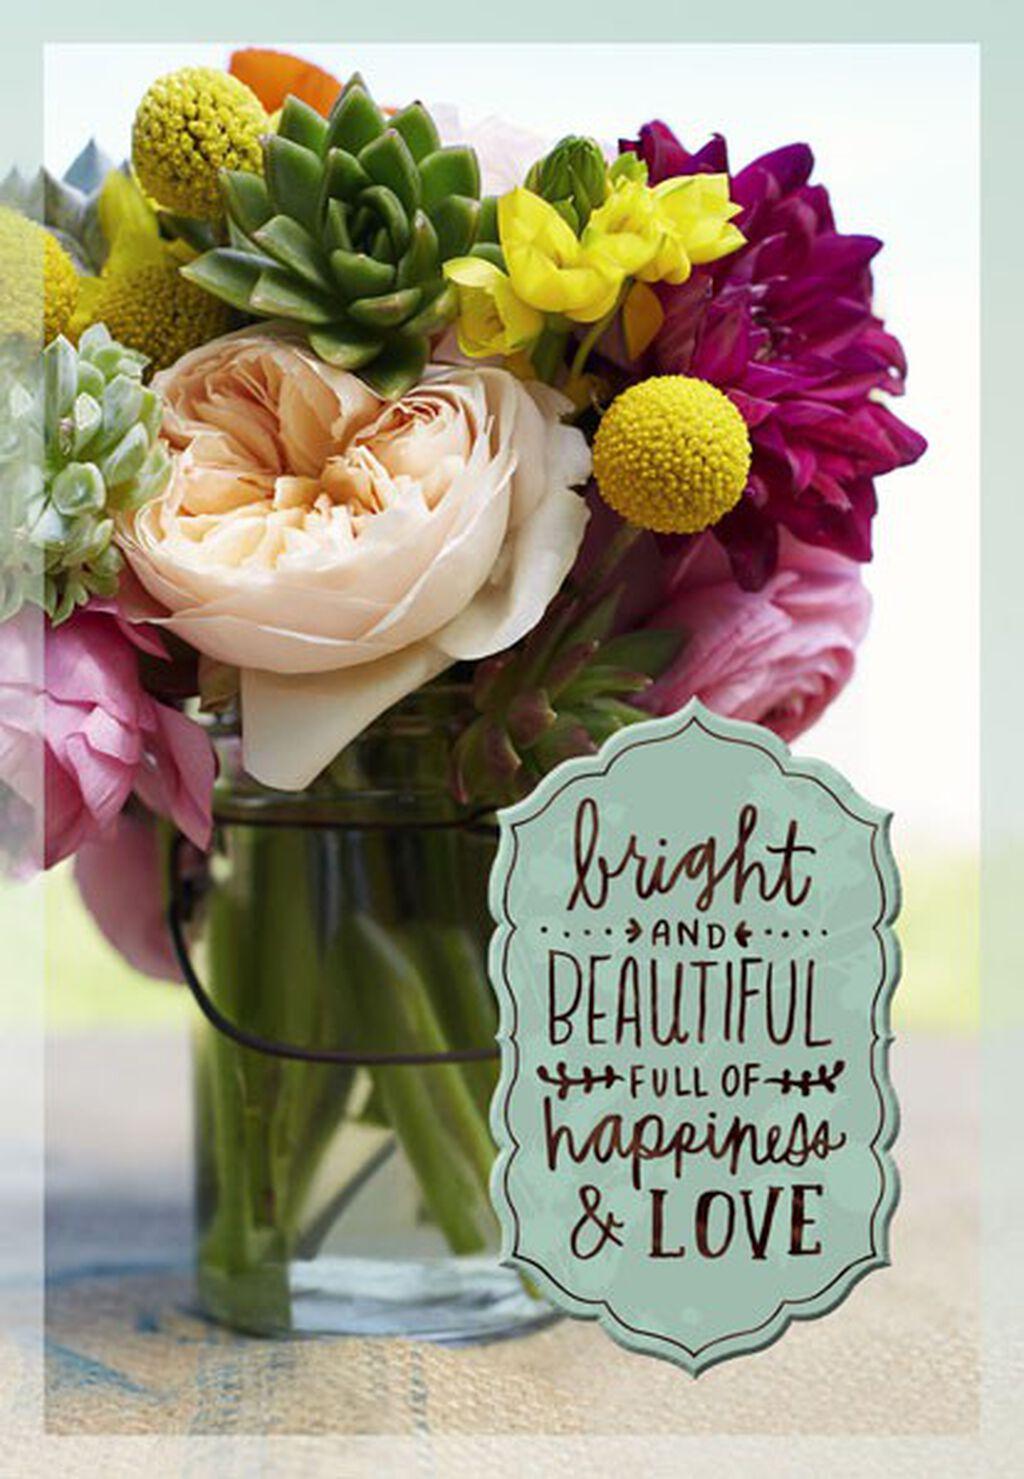 Bright and beautiful flowers birthday card greeting cards hallmark izmirmasajfo